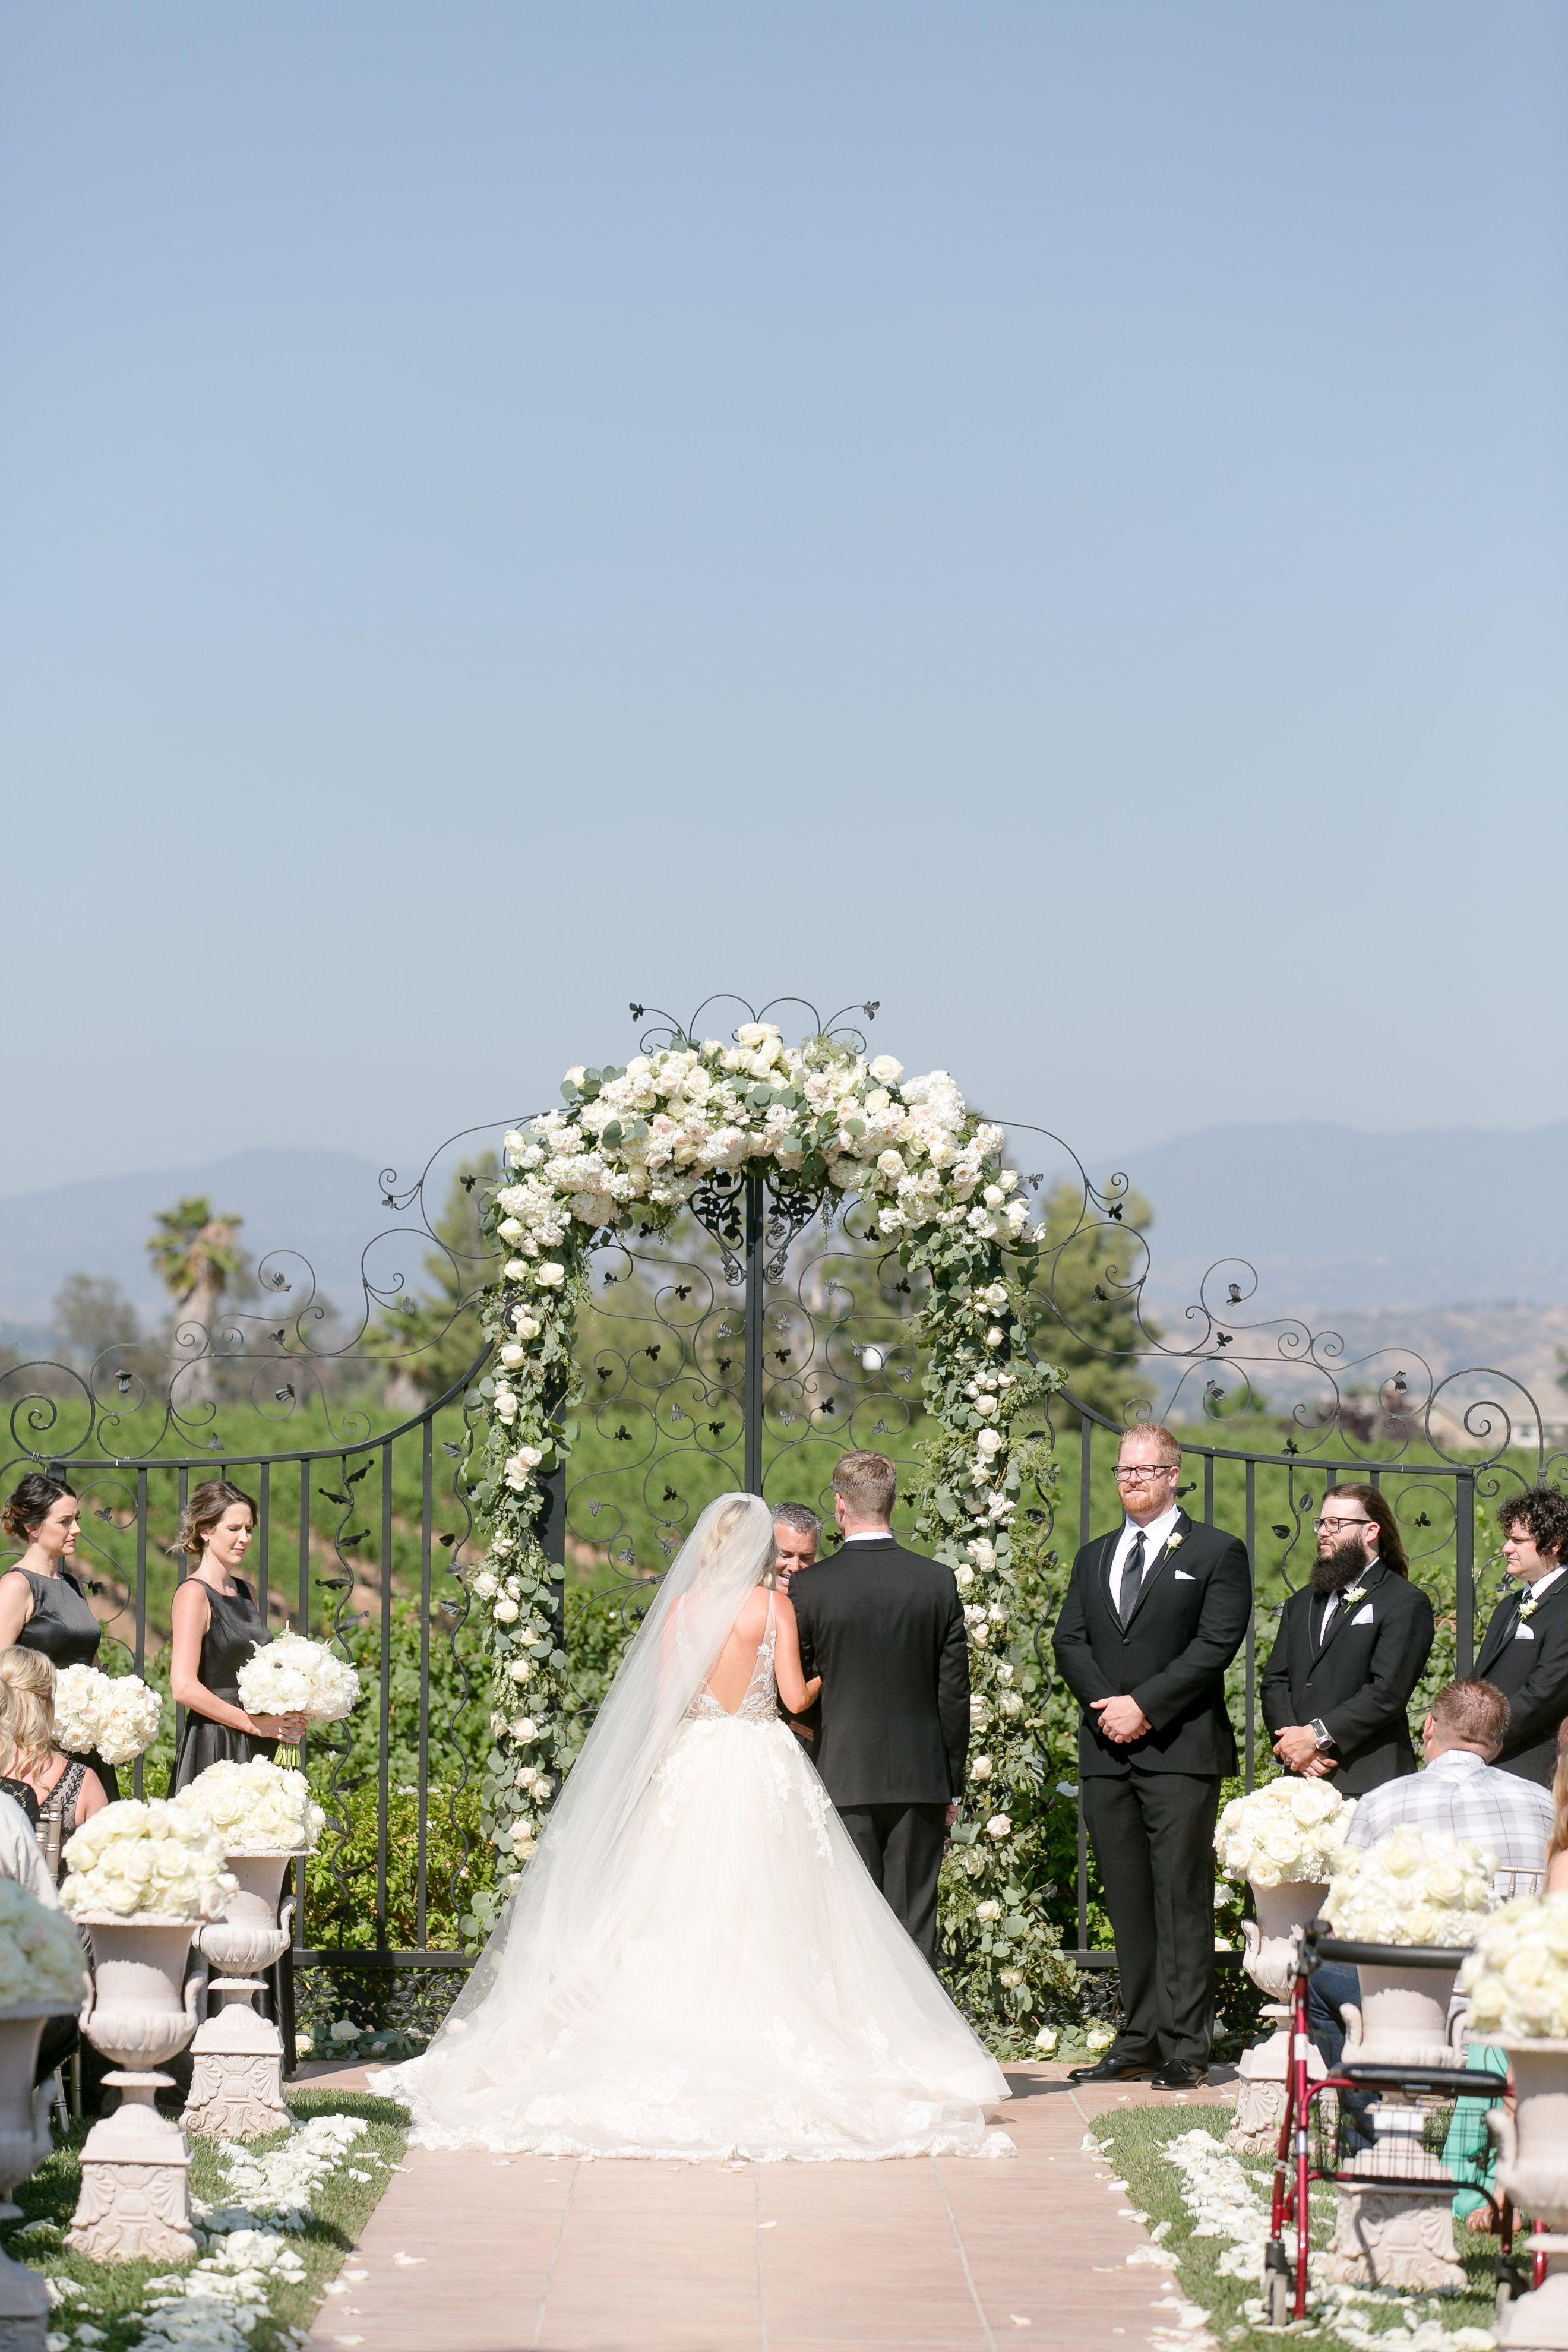 Pin by Villa de Amore California Wedd on Ceremony Setting